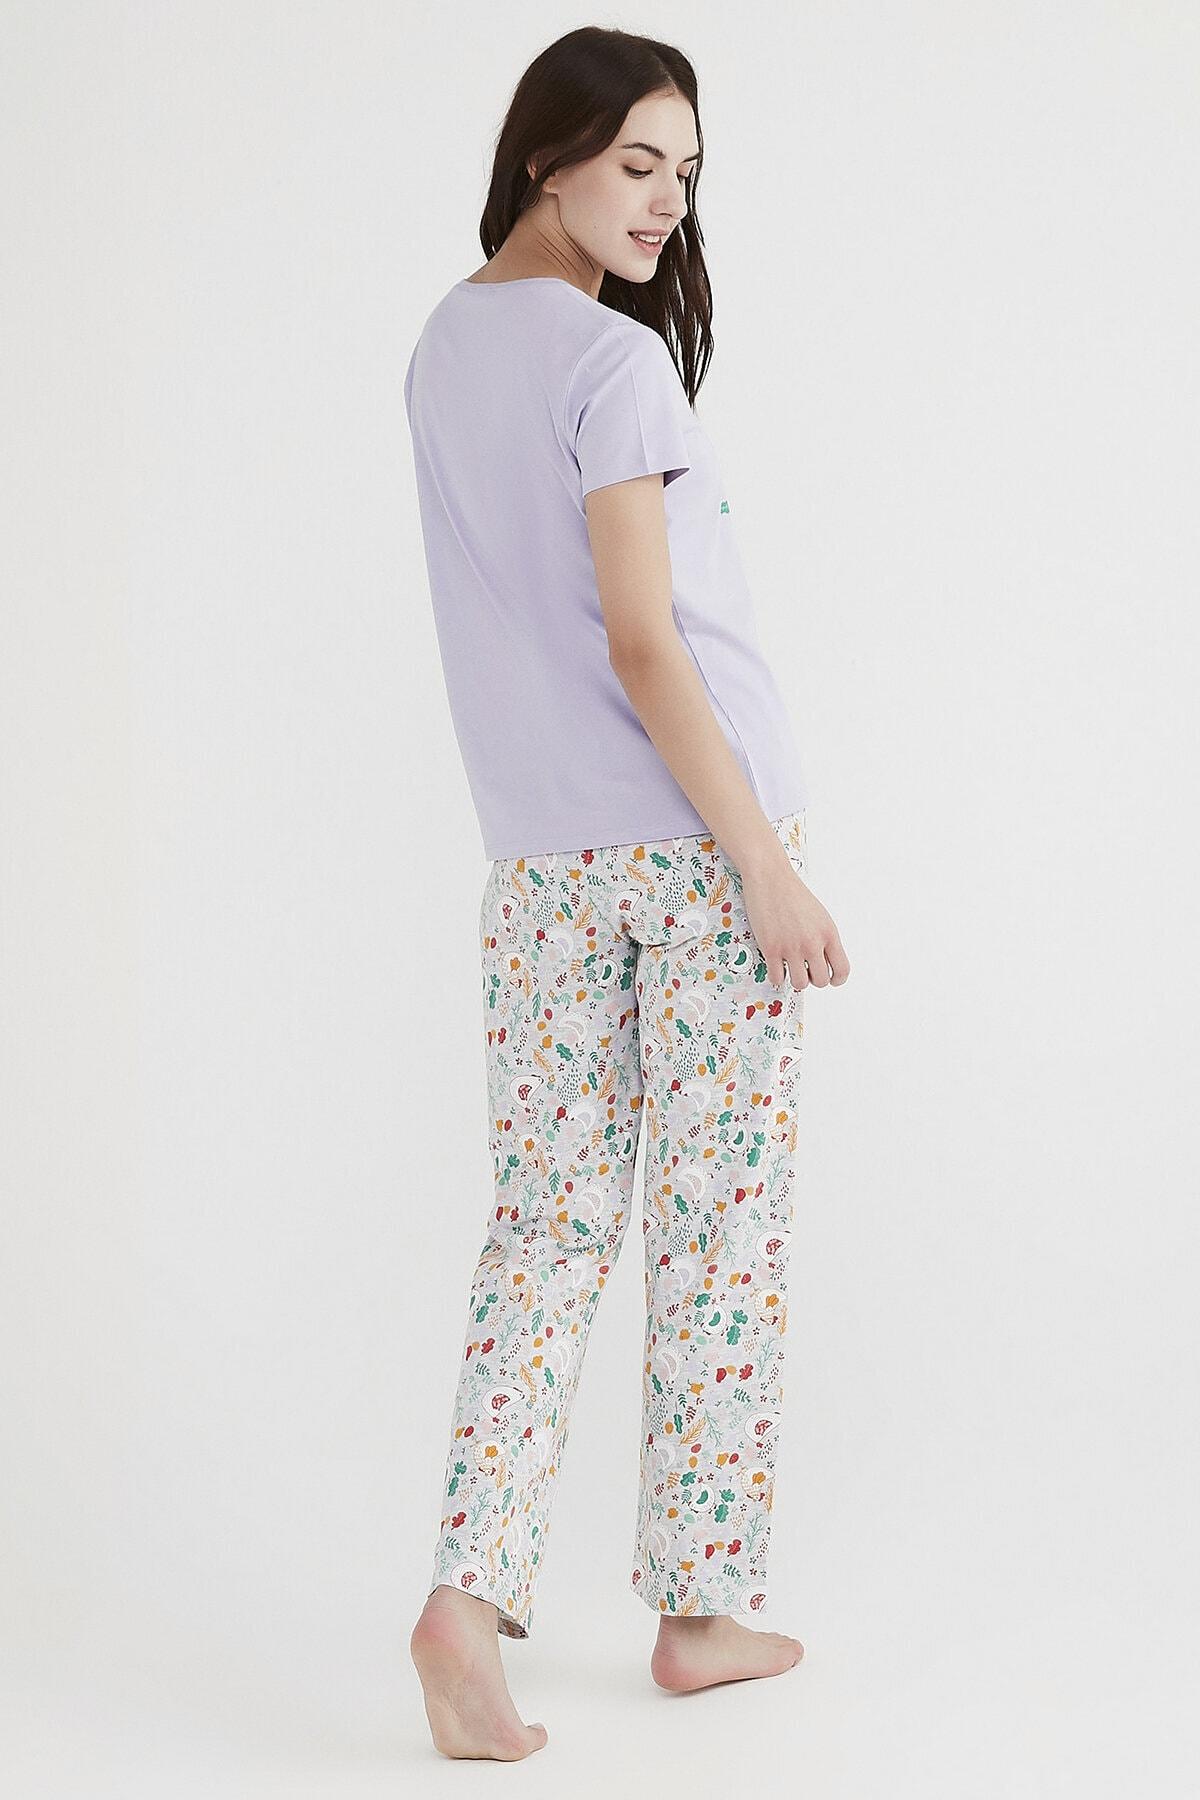 Penti Çok Renkli Don'T Panic Pijama Takımı 3